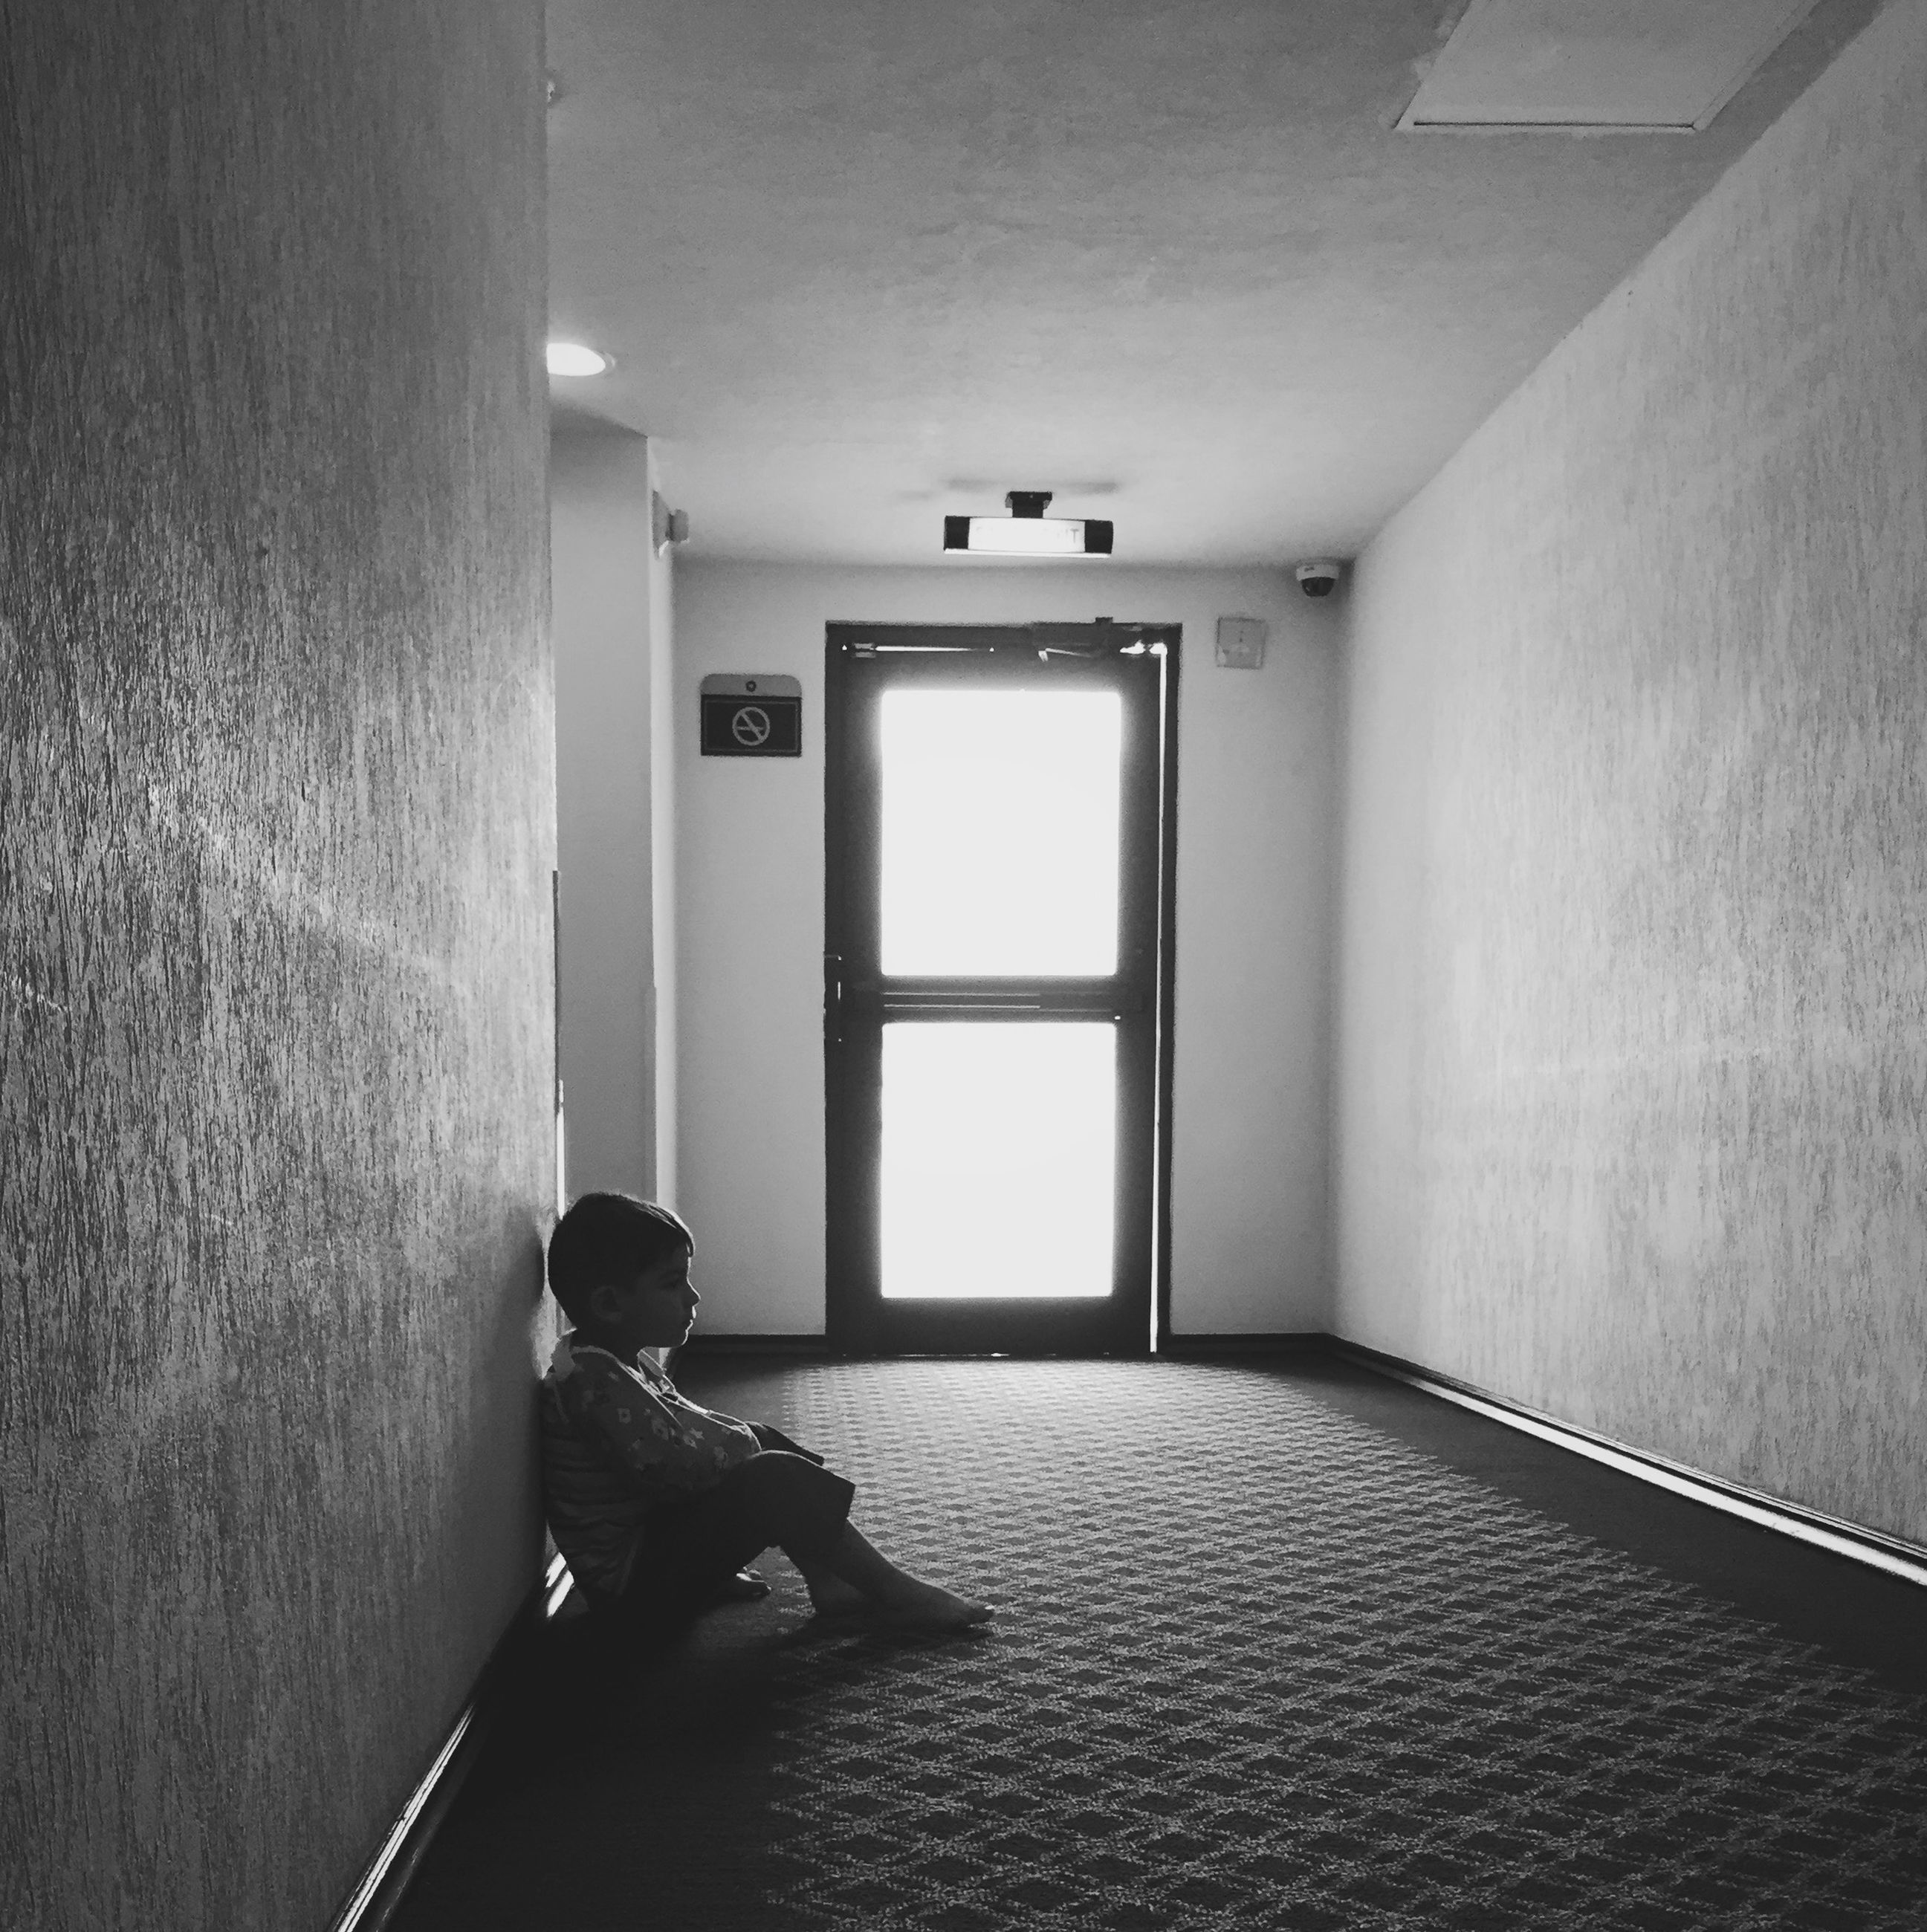 indoors, home interior, domestic room, corridor, architecture, door, empty, wall - building feature, absence, domestic life, wall, built structure, room, flooring, bathroom, window, tiled floor, house, interior, one person